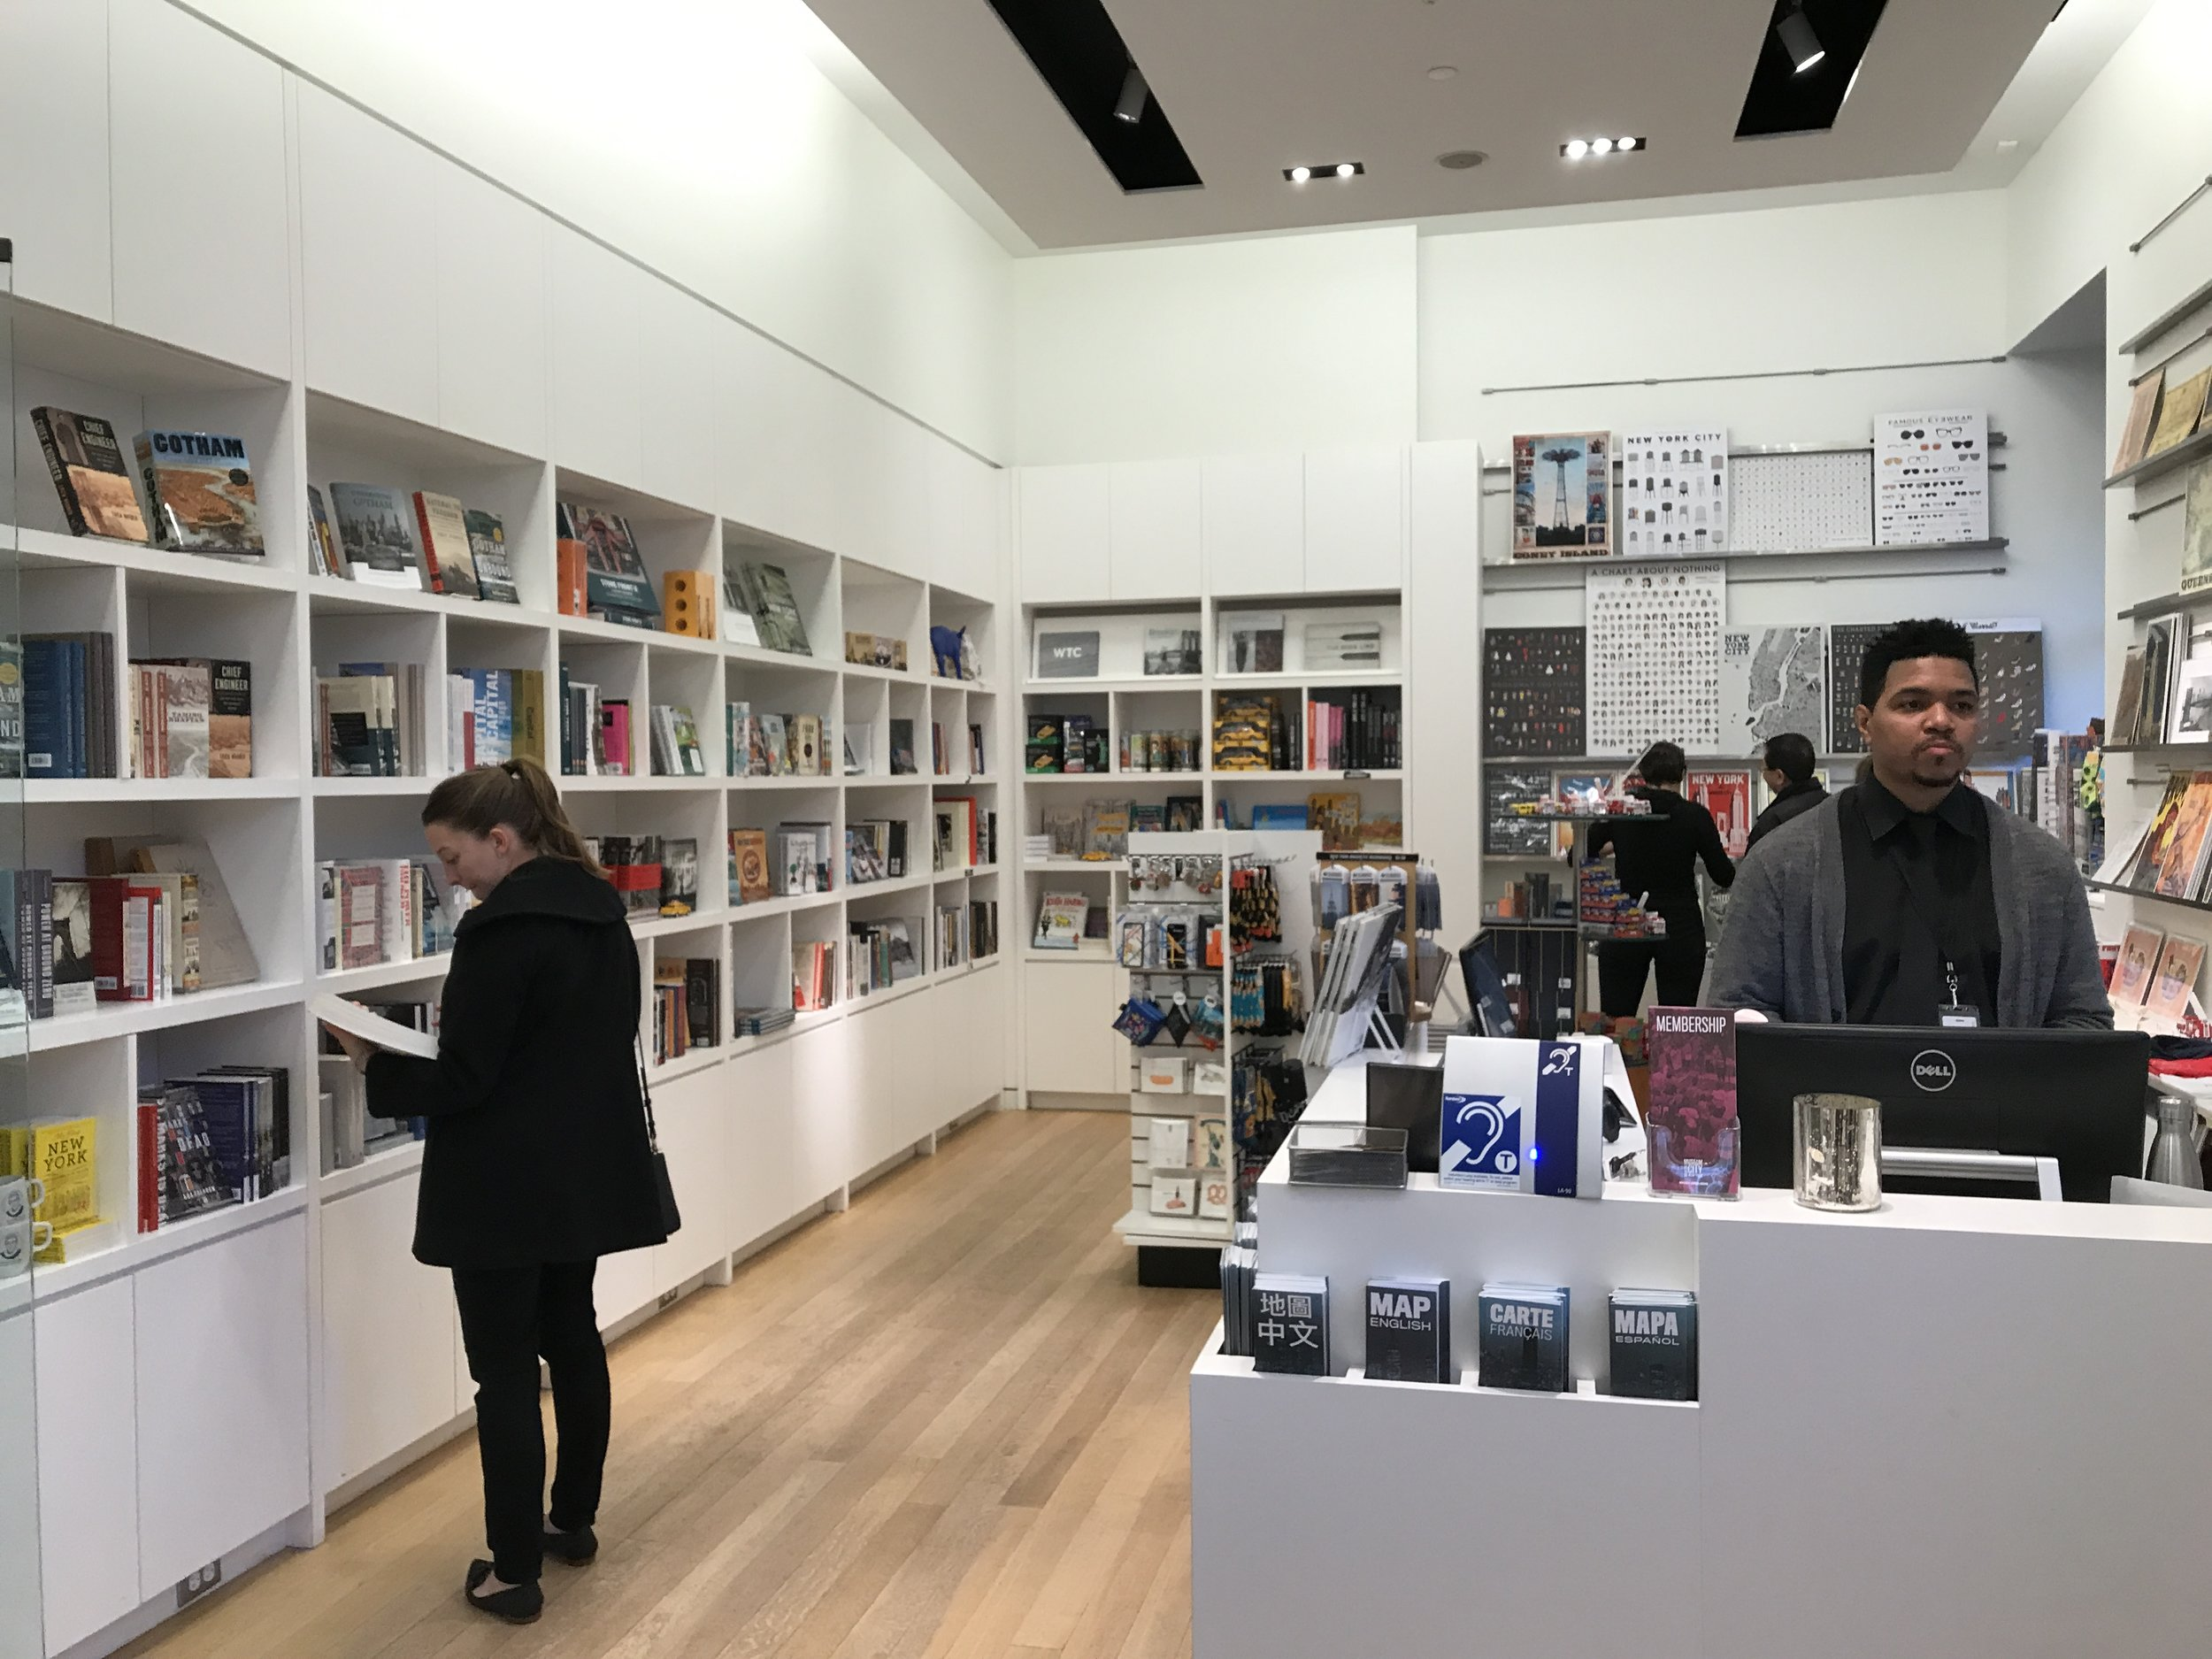 Shop 1 Interior 2.JPG